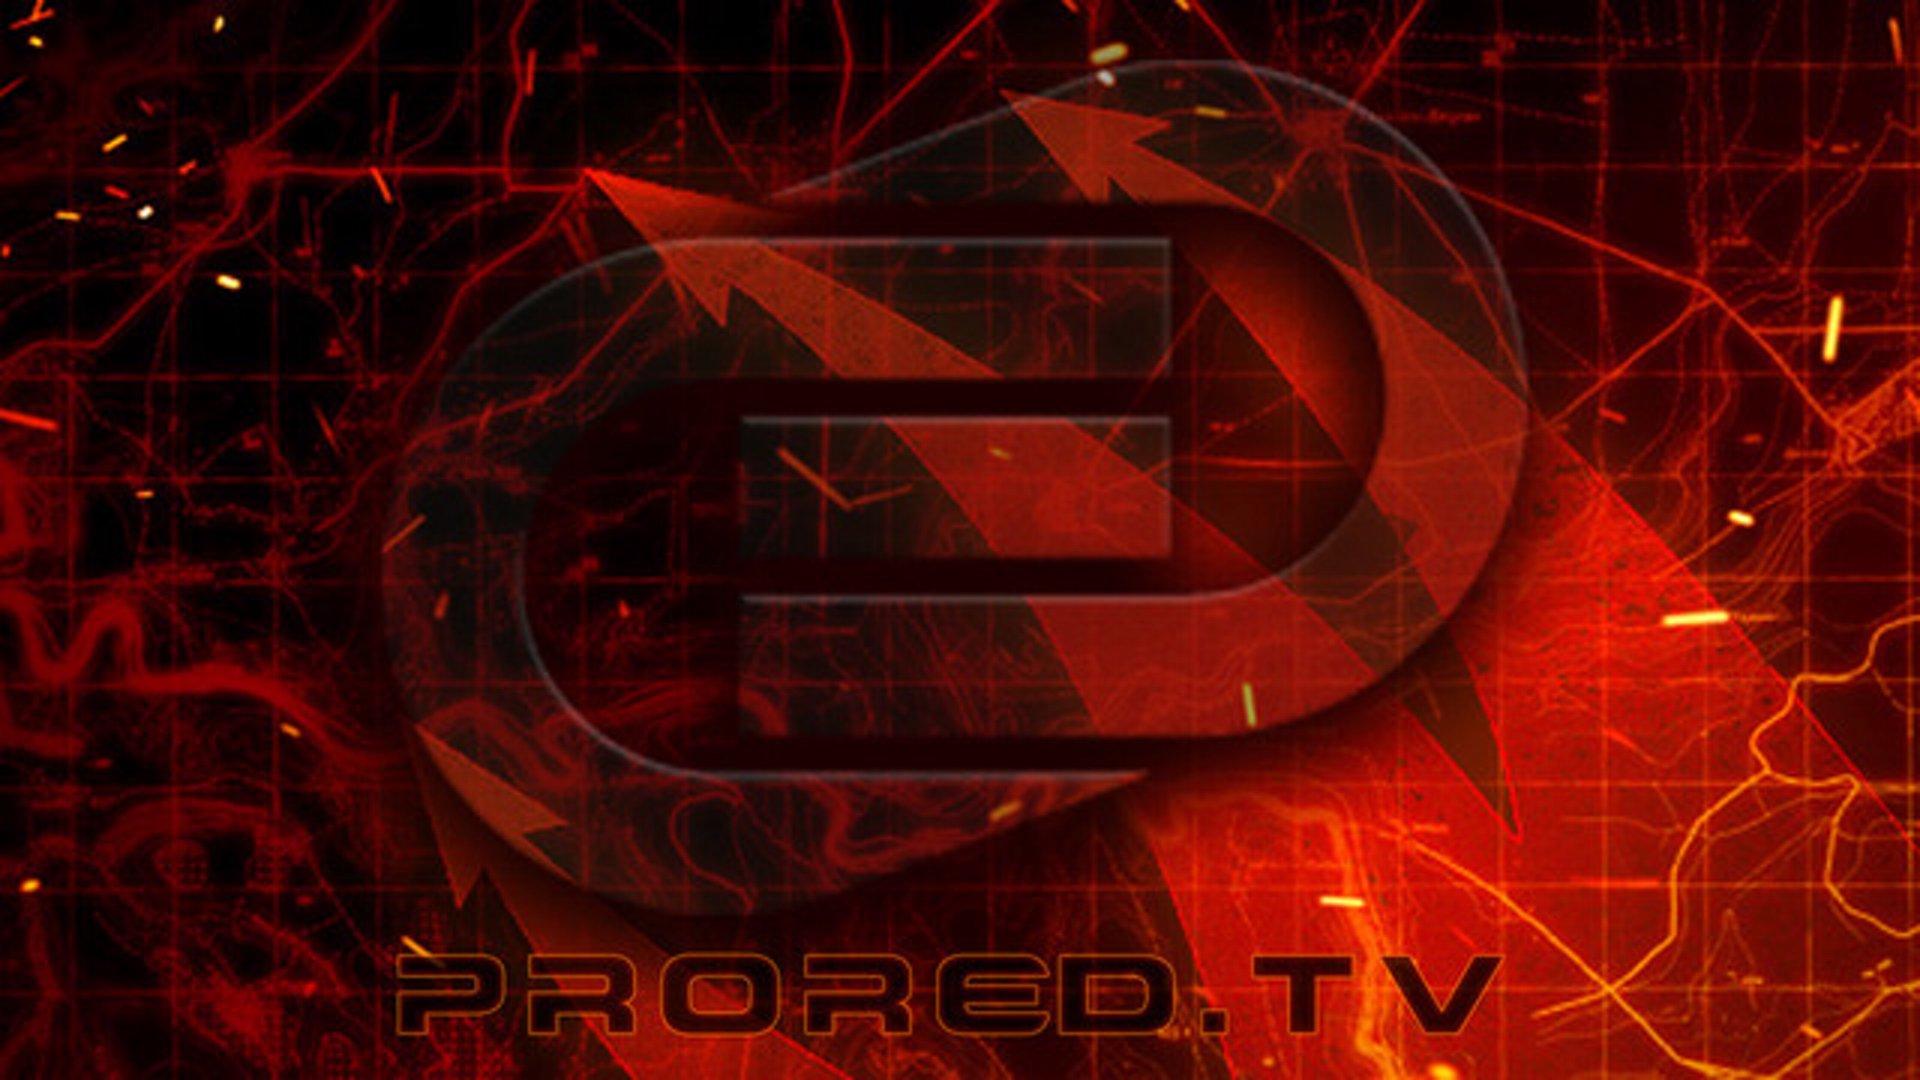 proredtv1